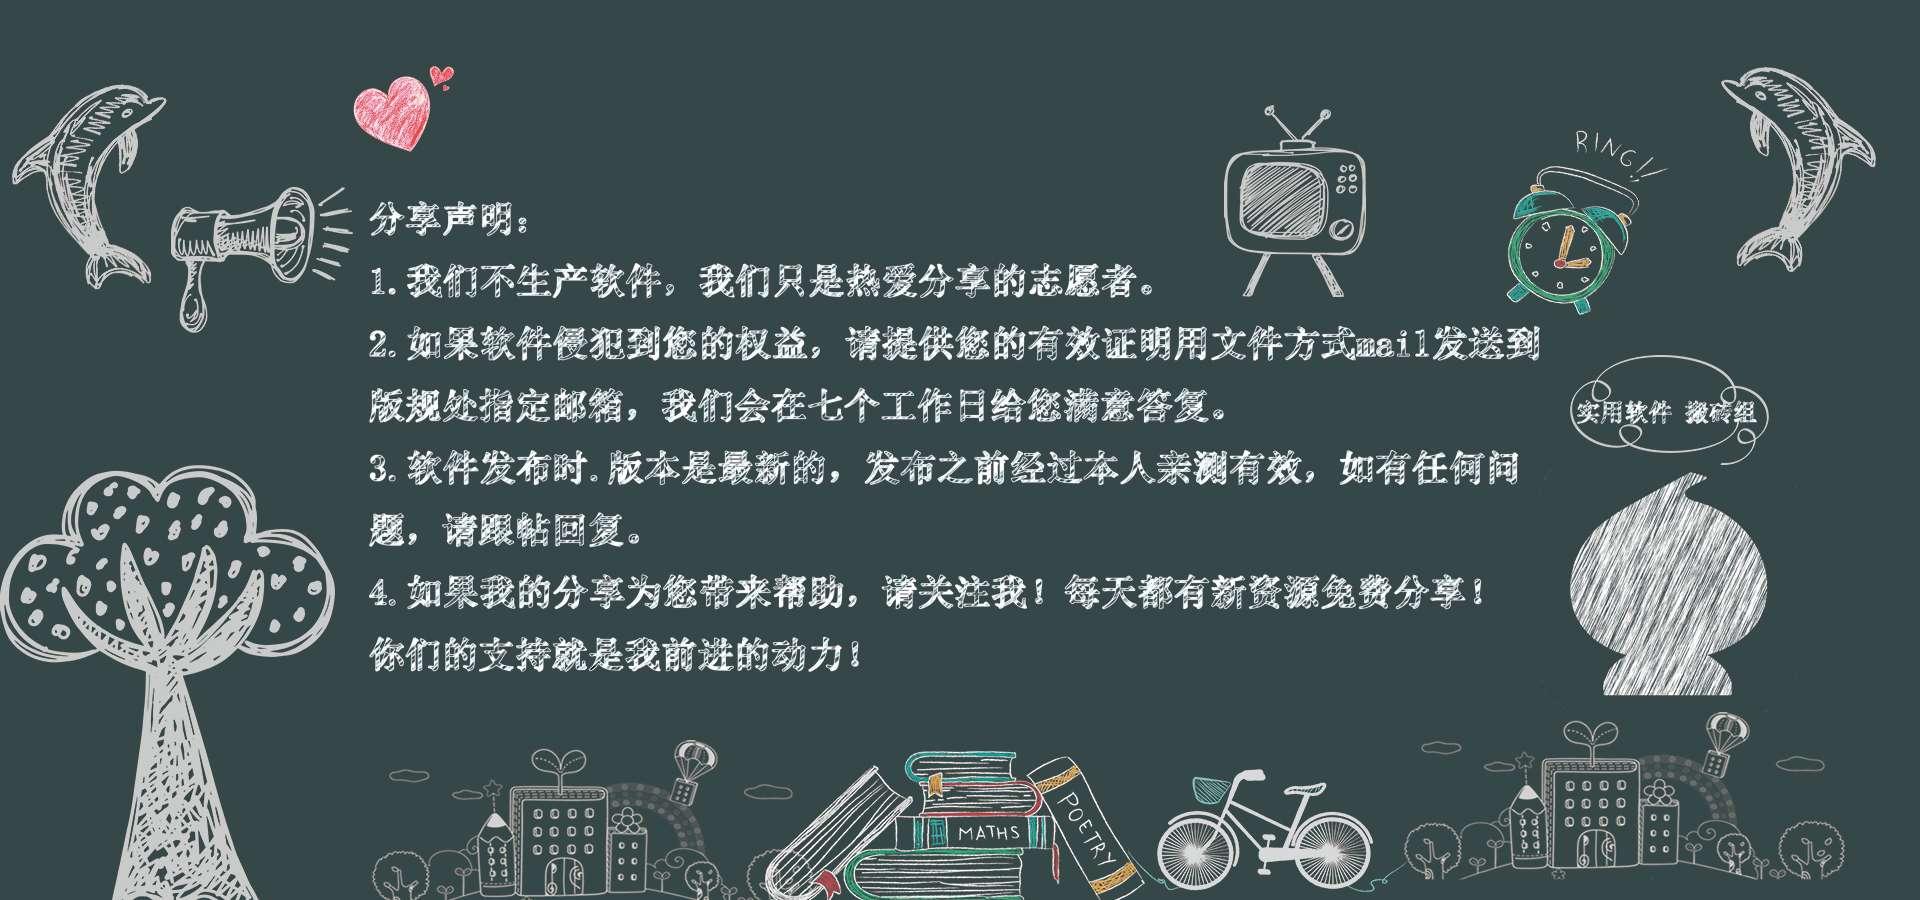 【资源分享】MediBang Paint v17.0 去广告版-爱小助